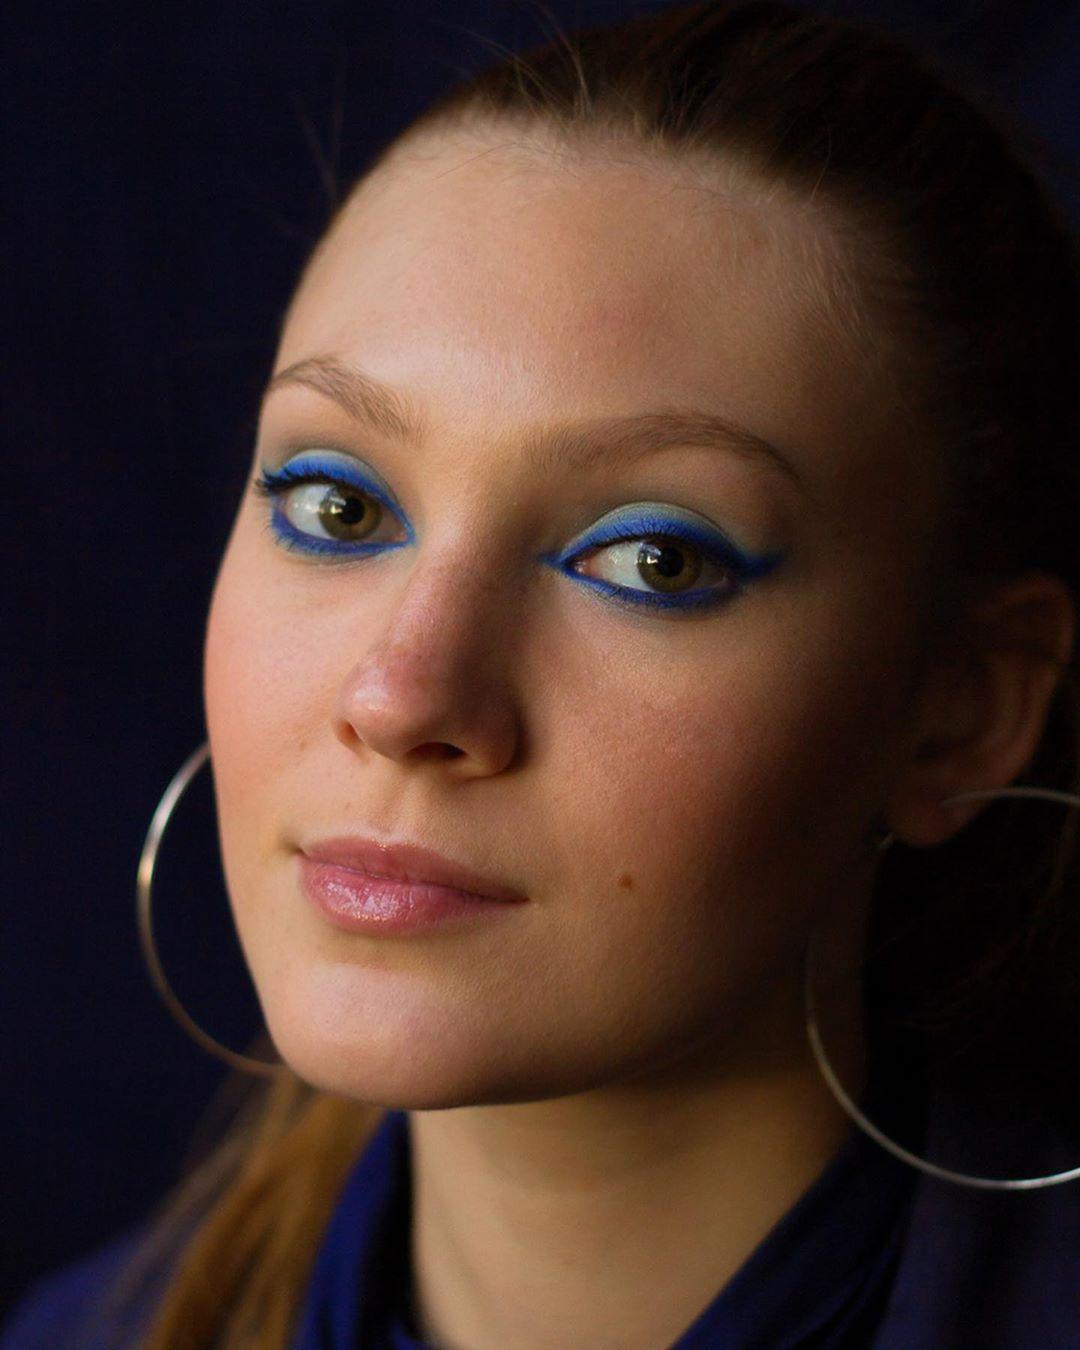 Blue by guadafeijoo ....#blueeyeshadow